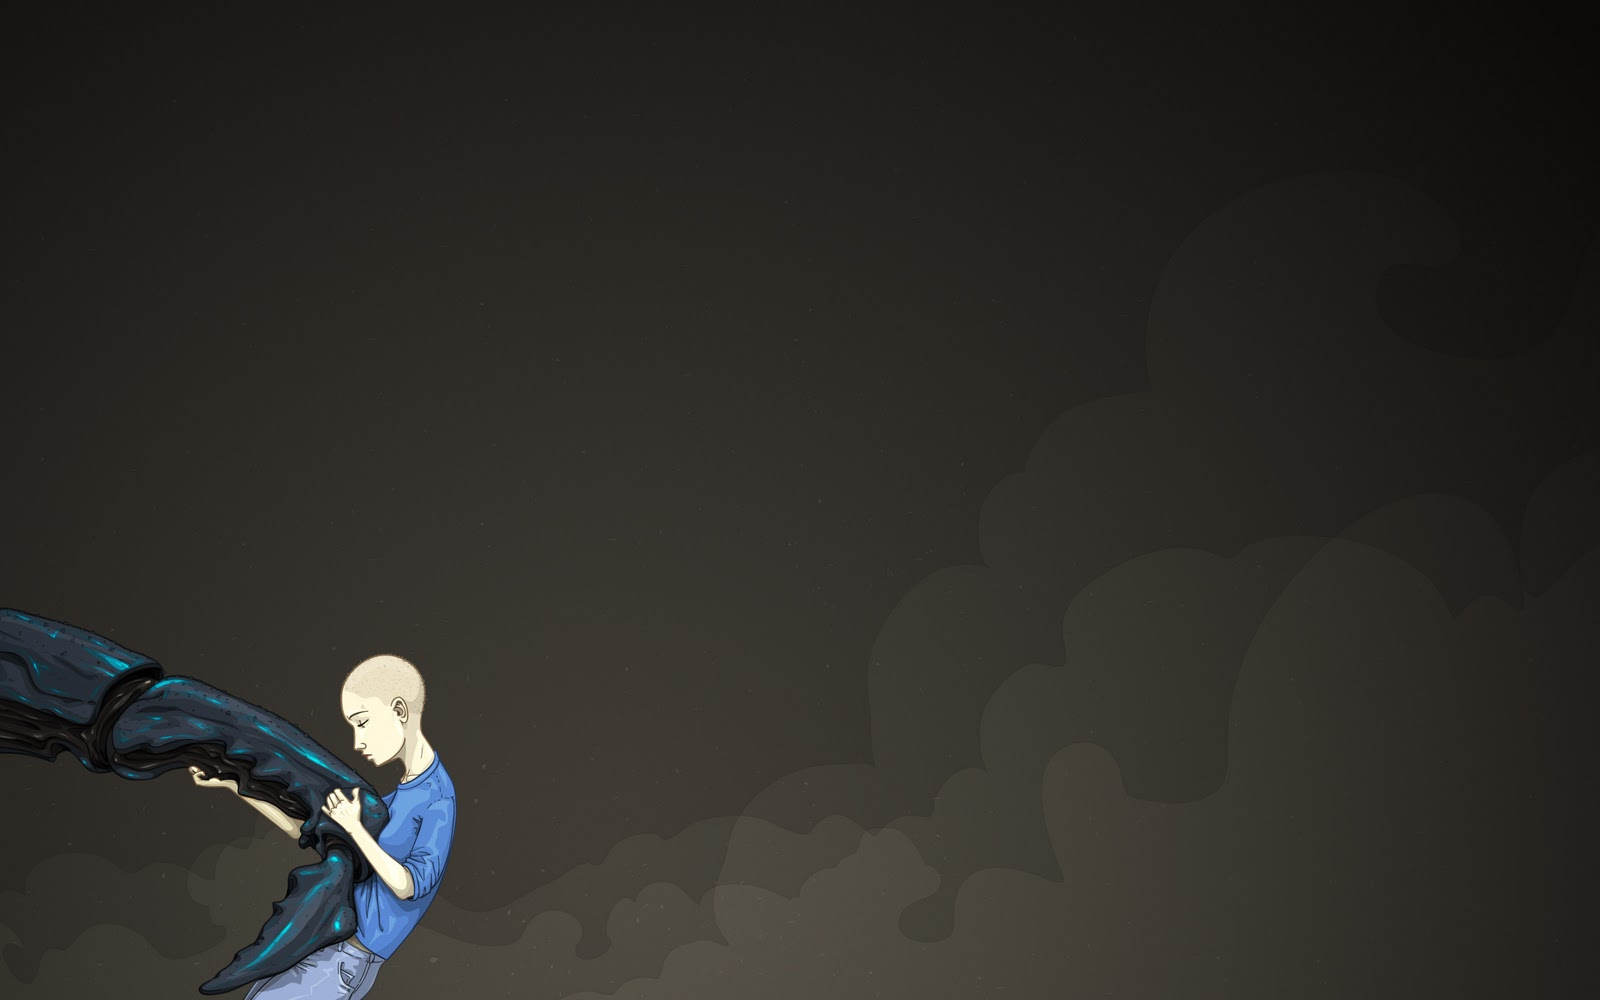 cool guy anime wallpaper 8 free hd wallpaper - animewp